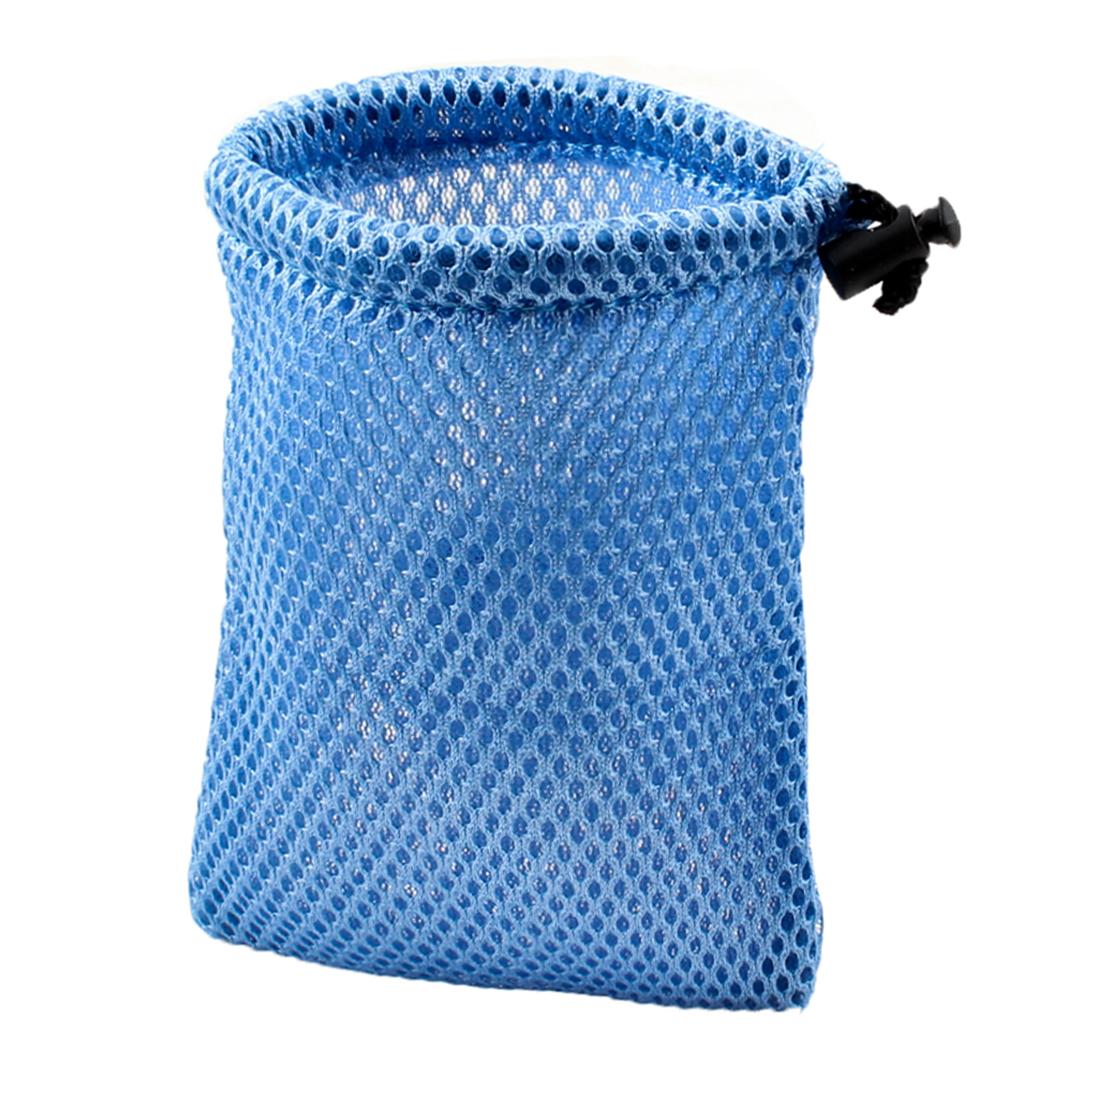 Car Accessory Blue Mesh Nylon Black Drawstring Glasses Money Phone Pouch